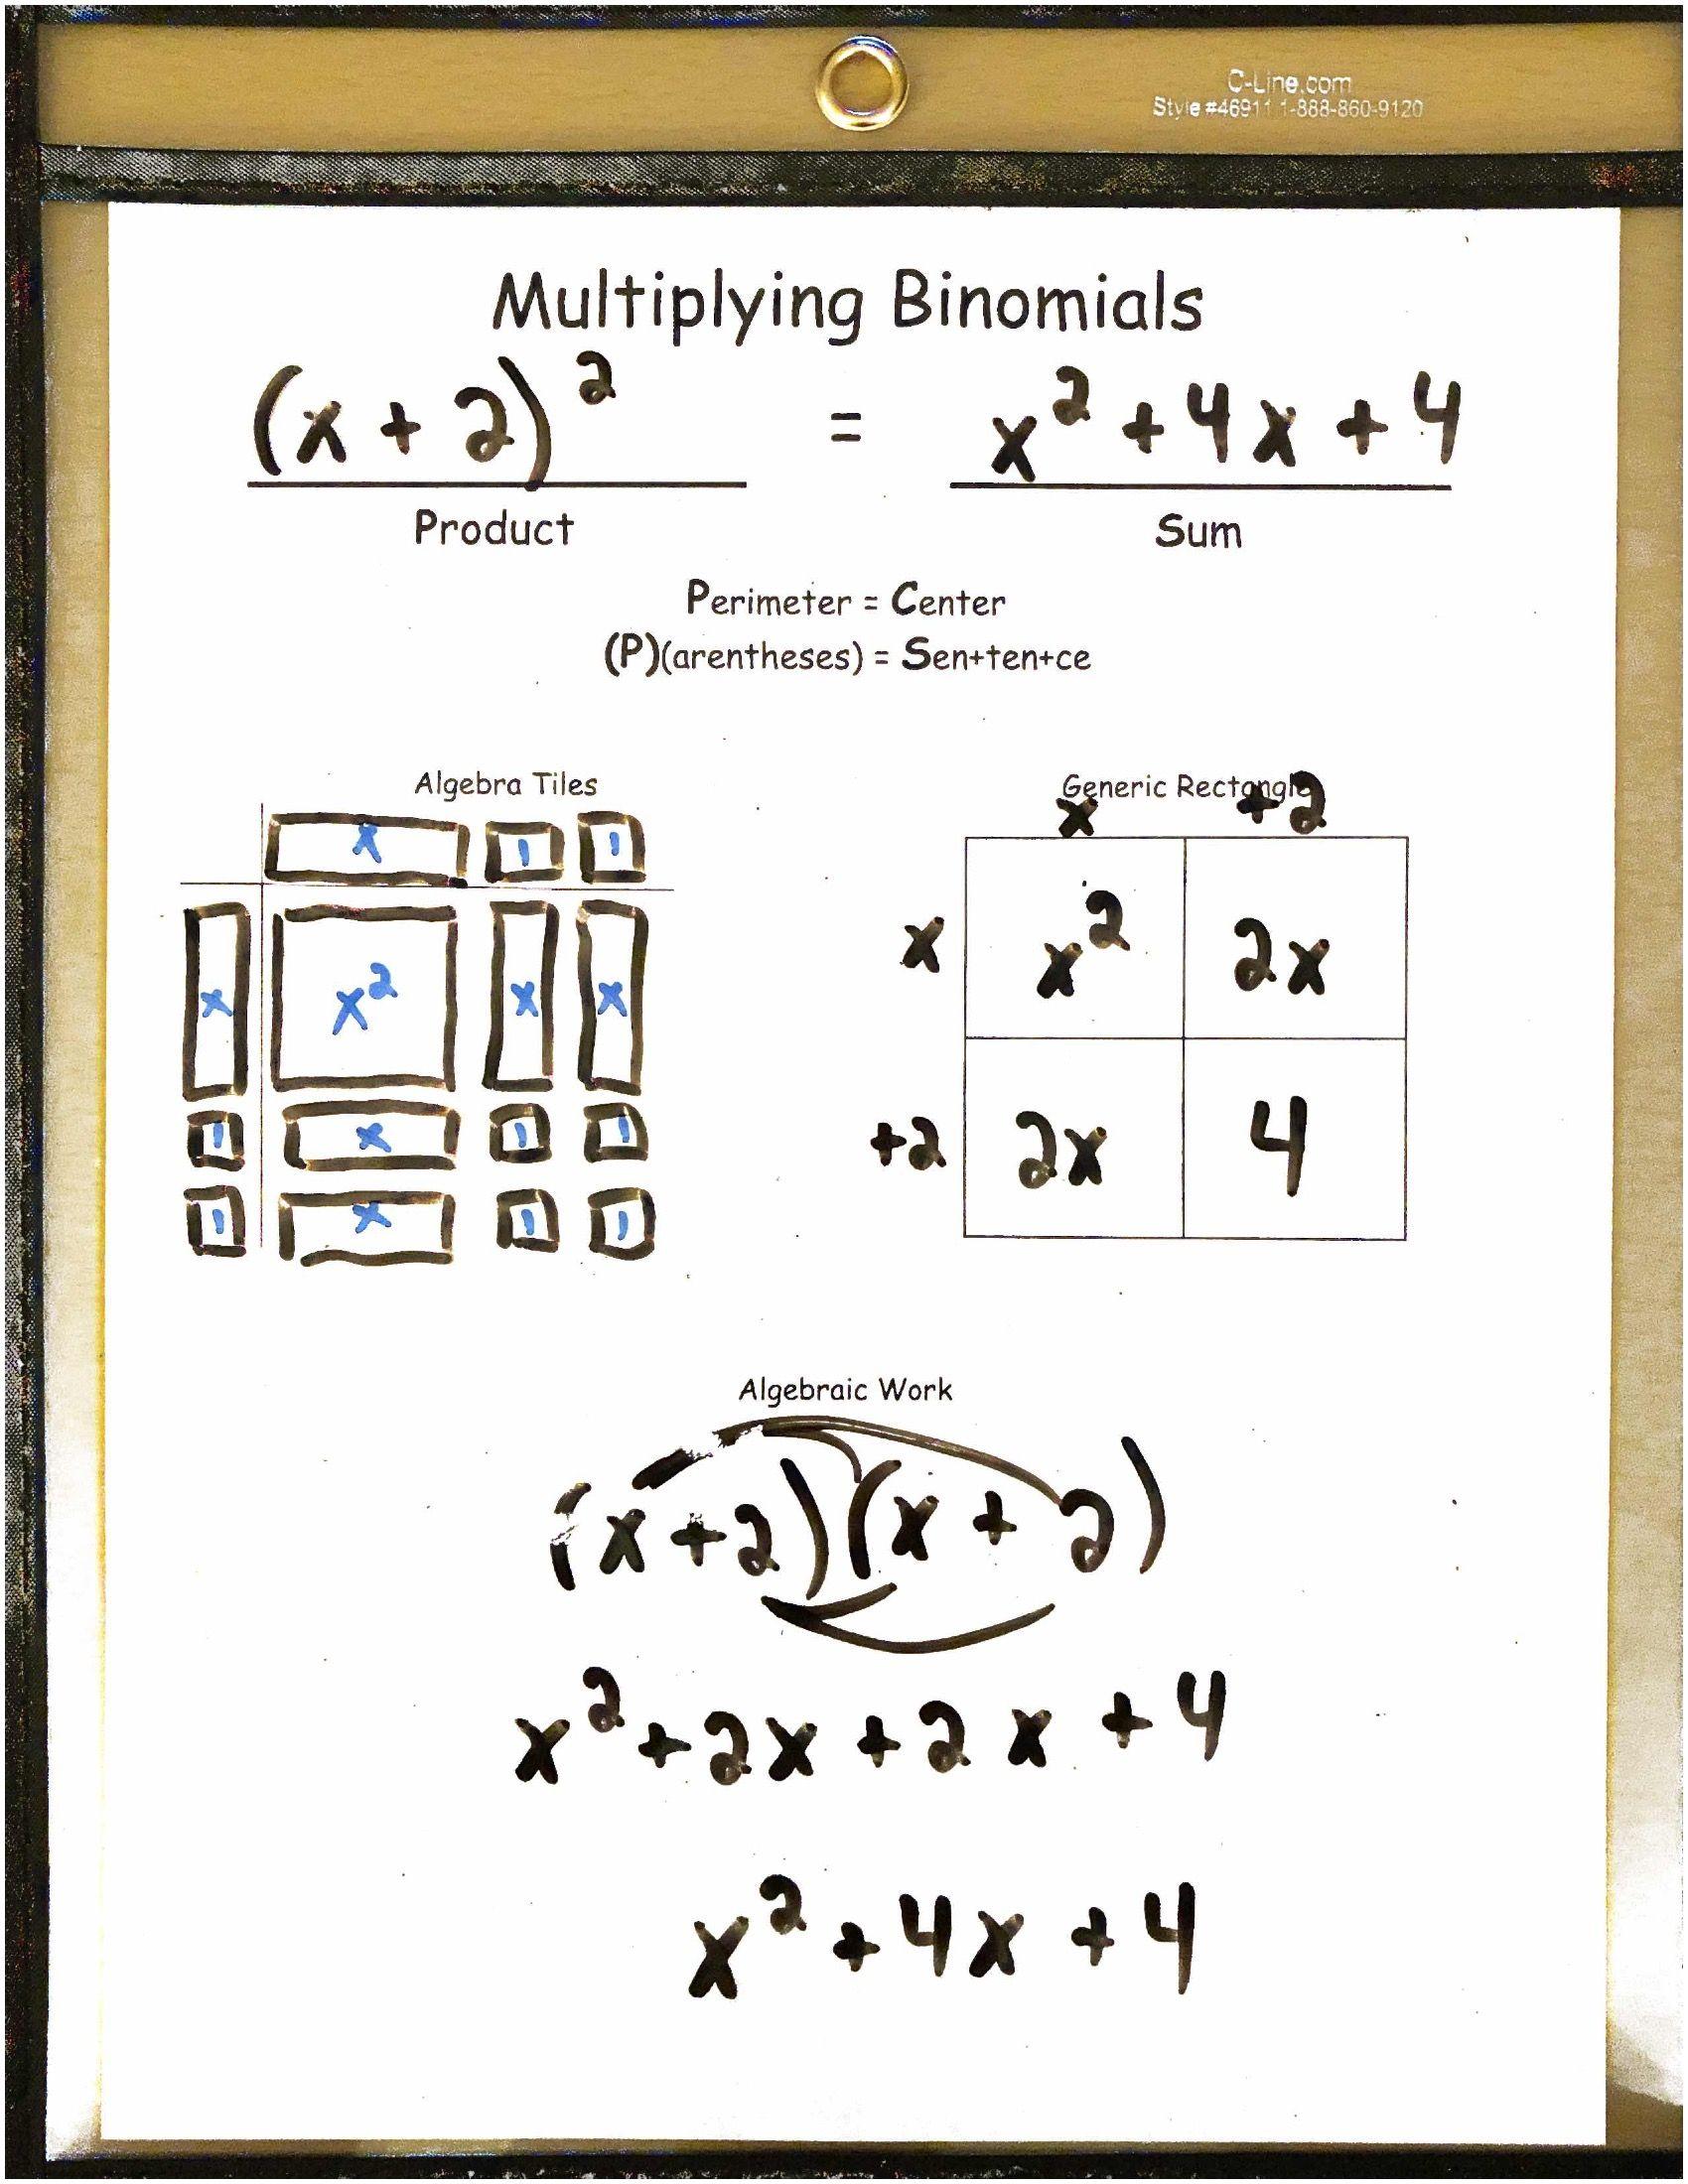 Multiplying Binomials Algebra 1 Reusable Dry Erase Pocket Guides Math Algebra1 Tpt Algebra Graphing Quadratics Algebra 1 [ 2200 x 1700 Pixel ]